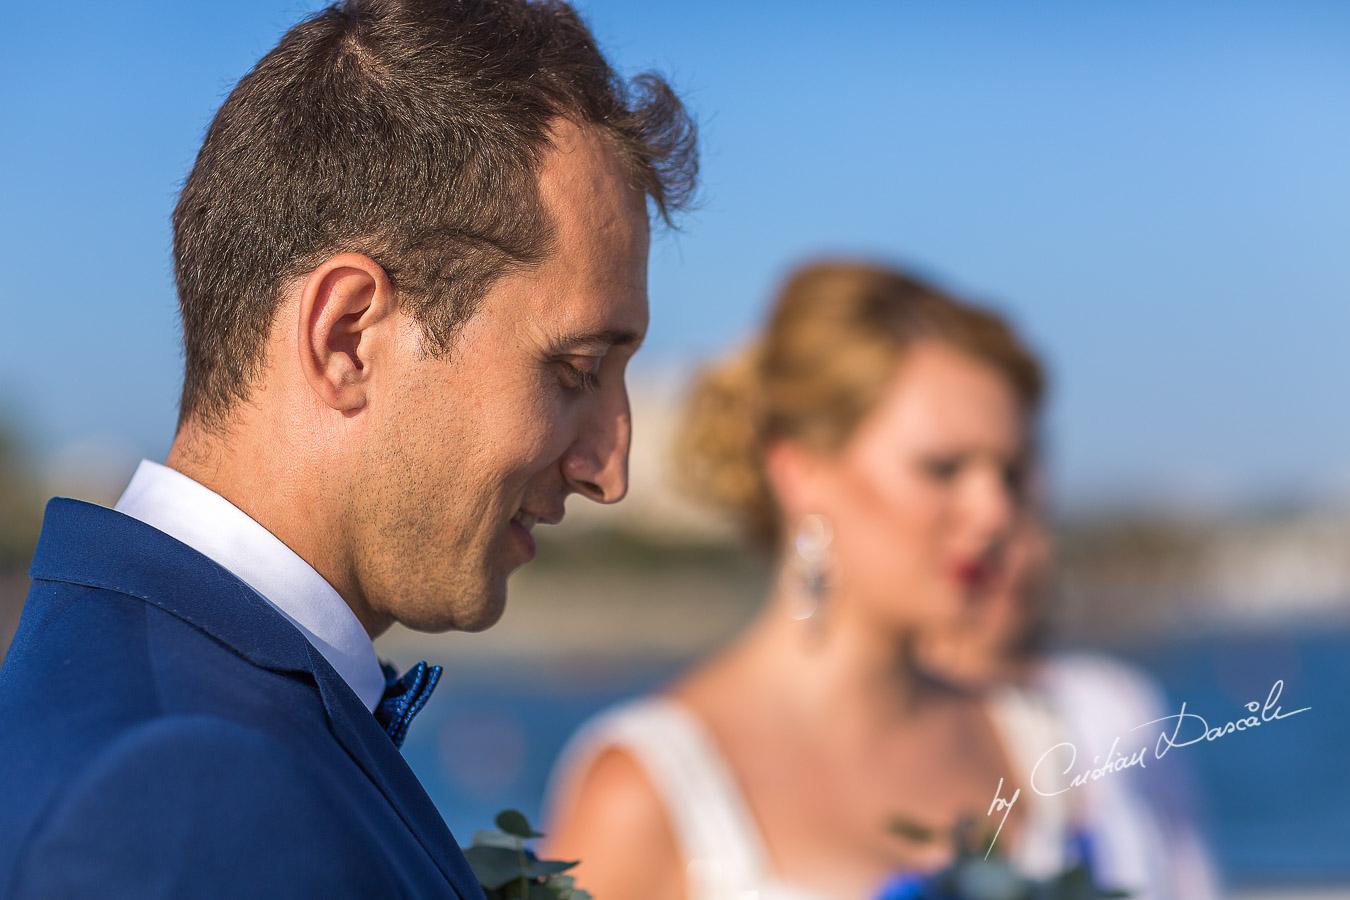 Emotional Wedding moment captured at Elias Beach Hotel in Limassol by Cristian Dascalu